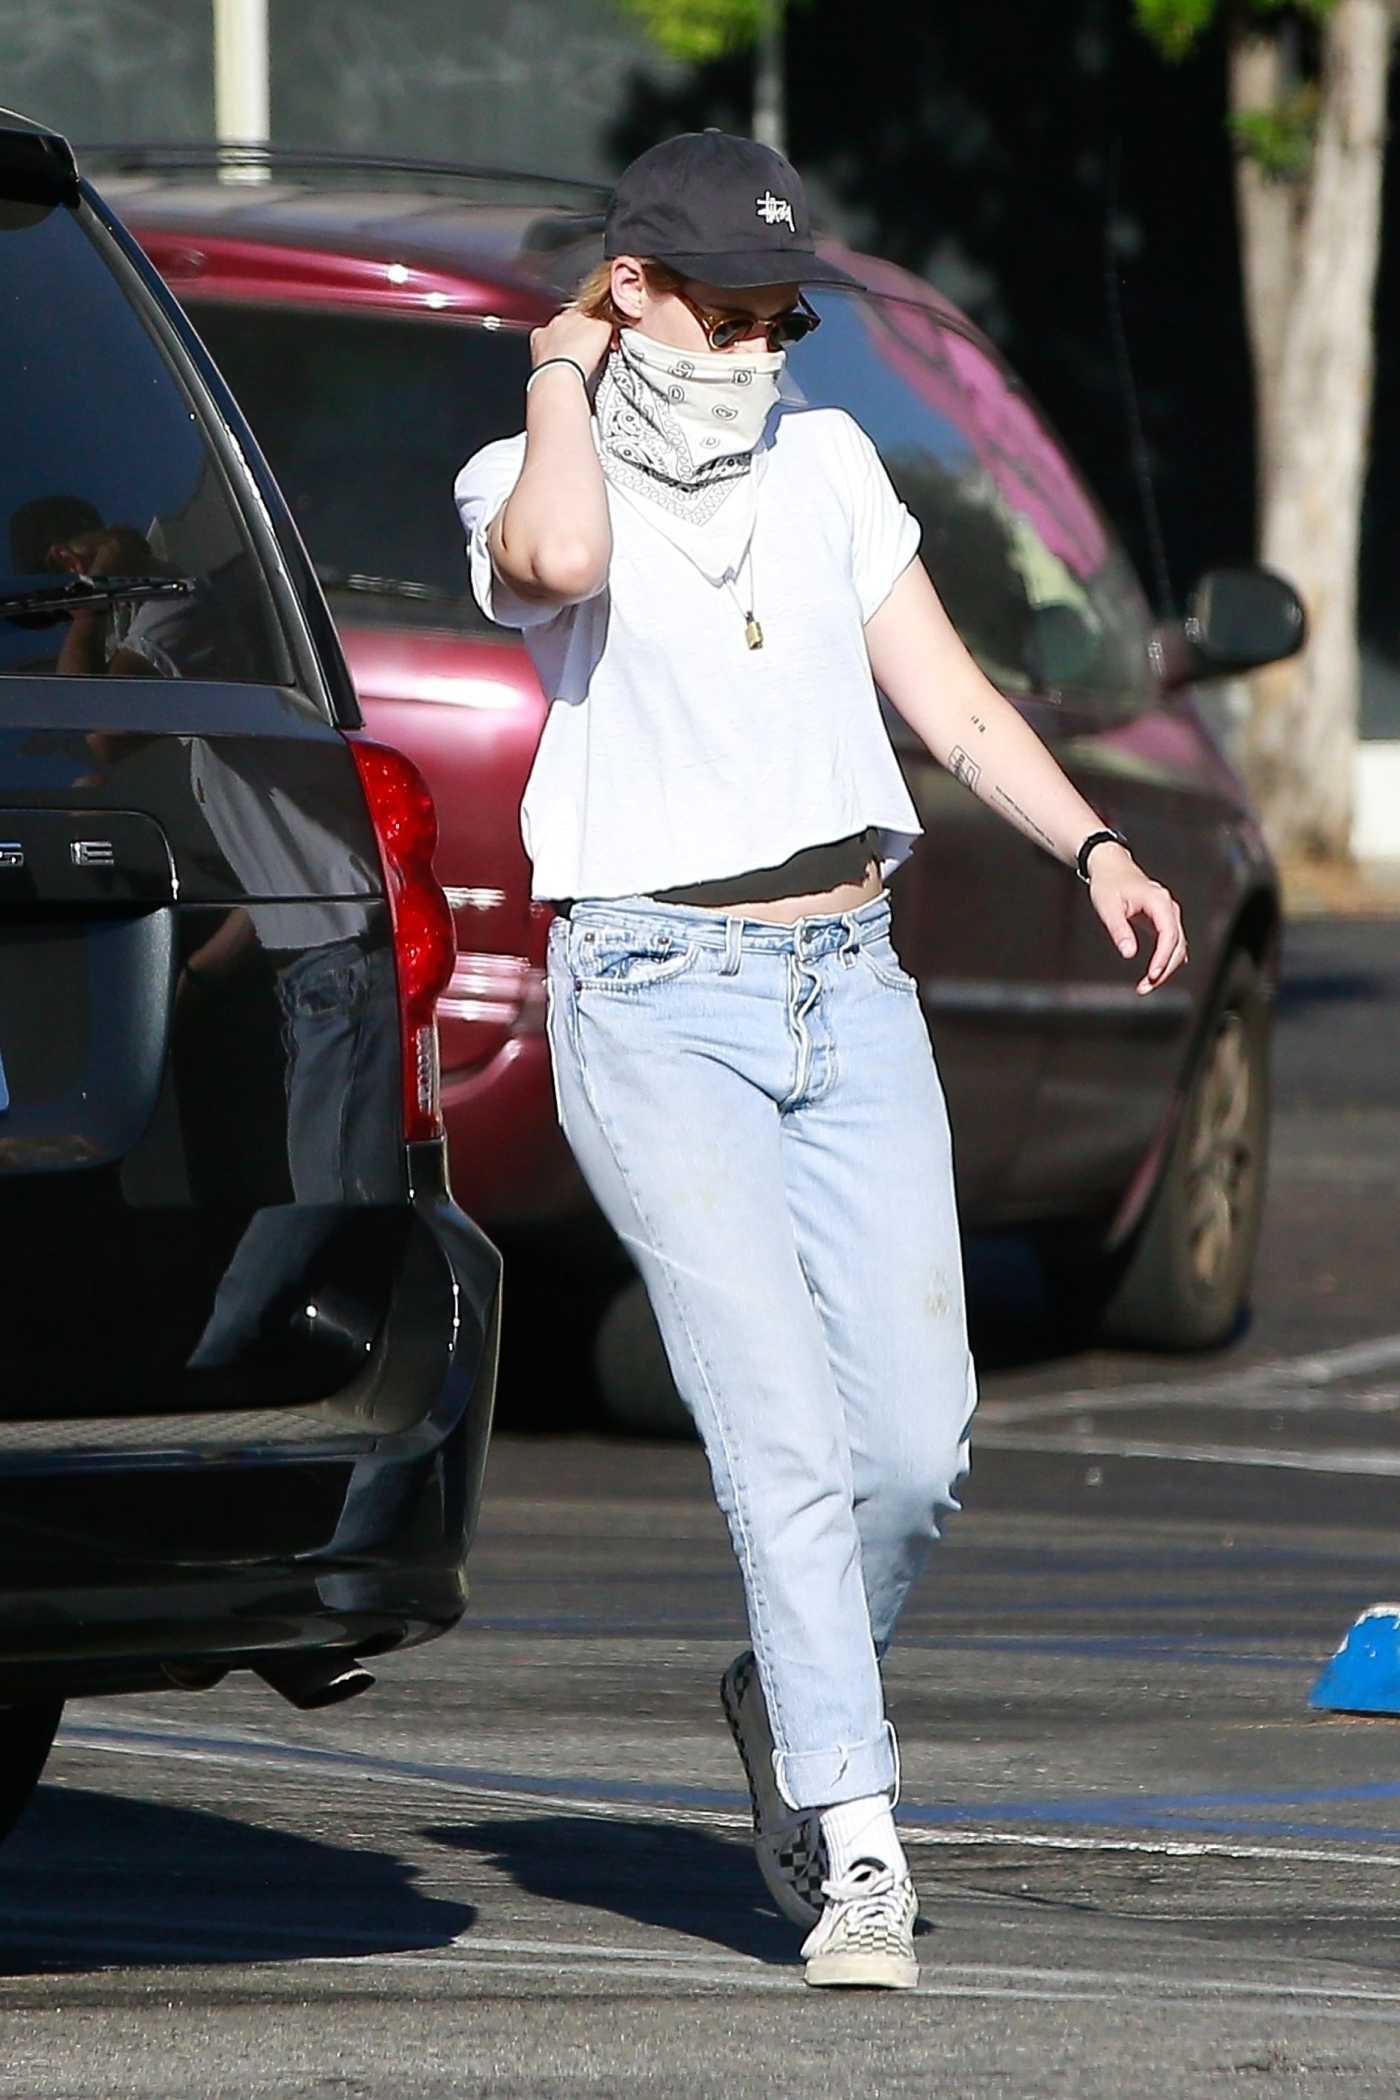 Kristen Stewart in a White Tee Goes Shopping at Rite Aid in Los Feliz 07/09/2020